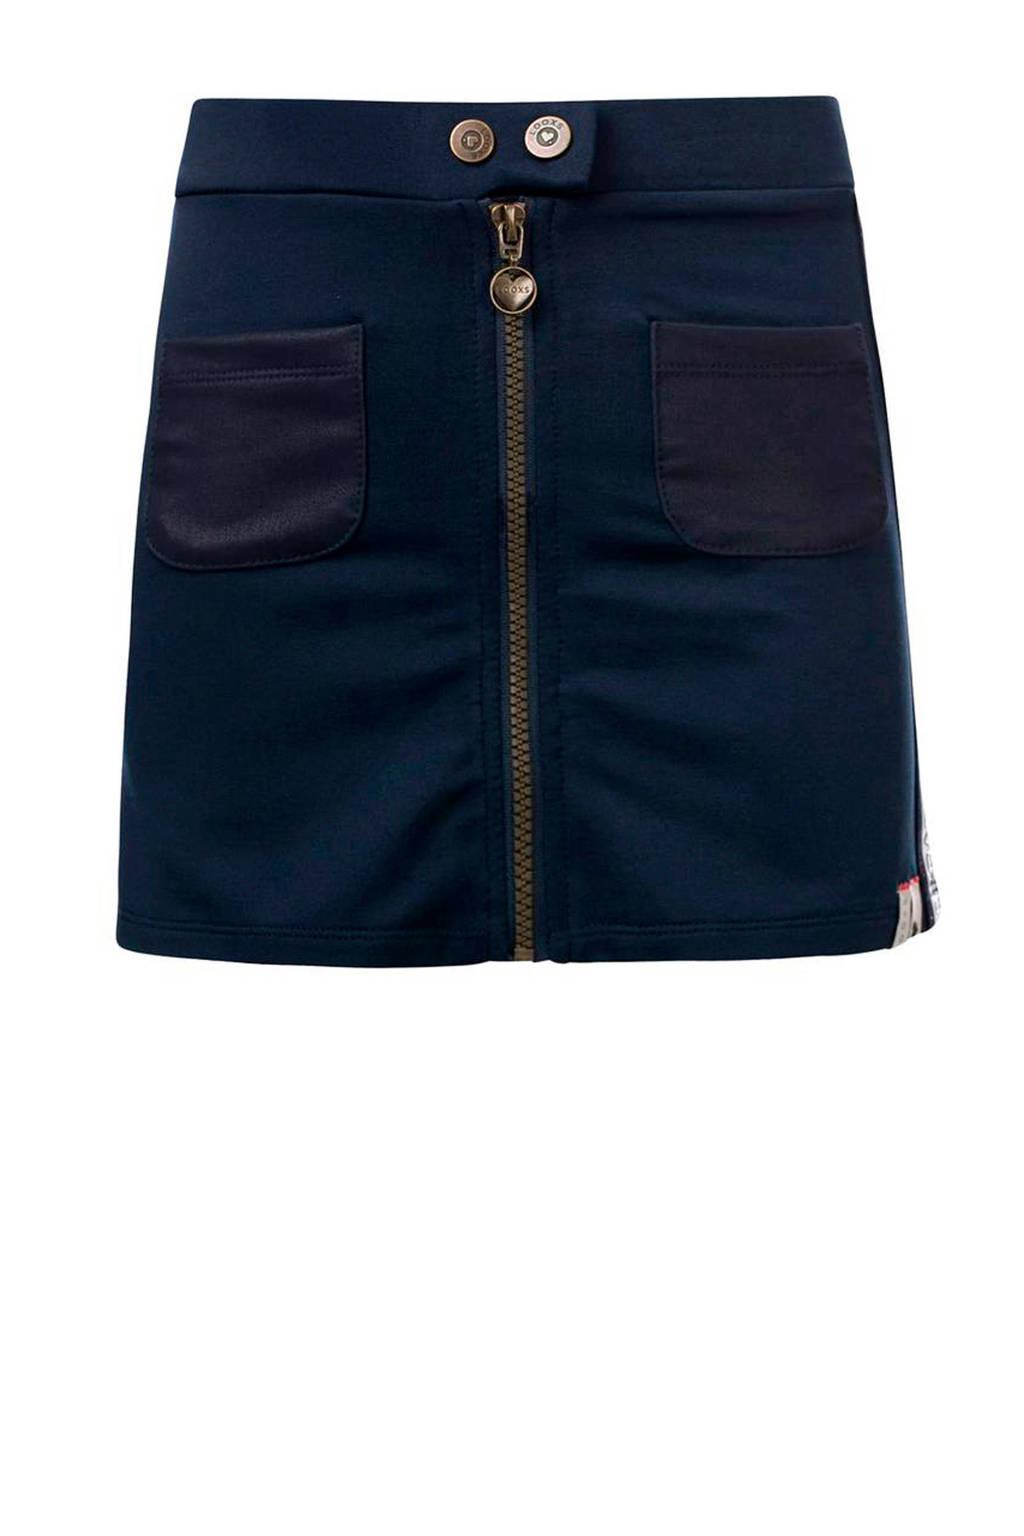 LOOXS rok met contrastbies donkerblauw, Donkerblauw